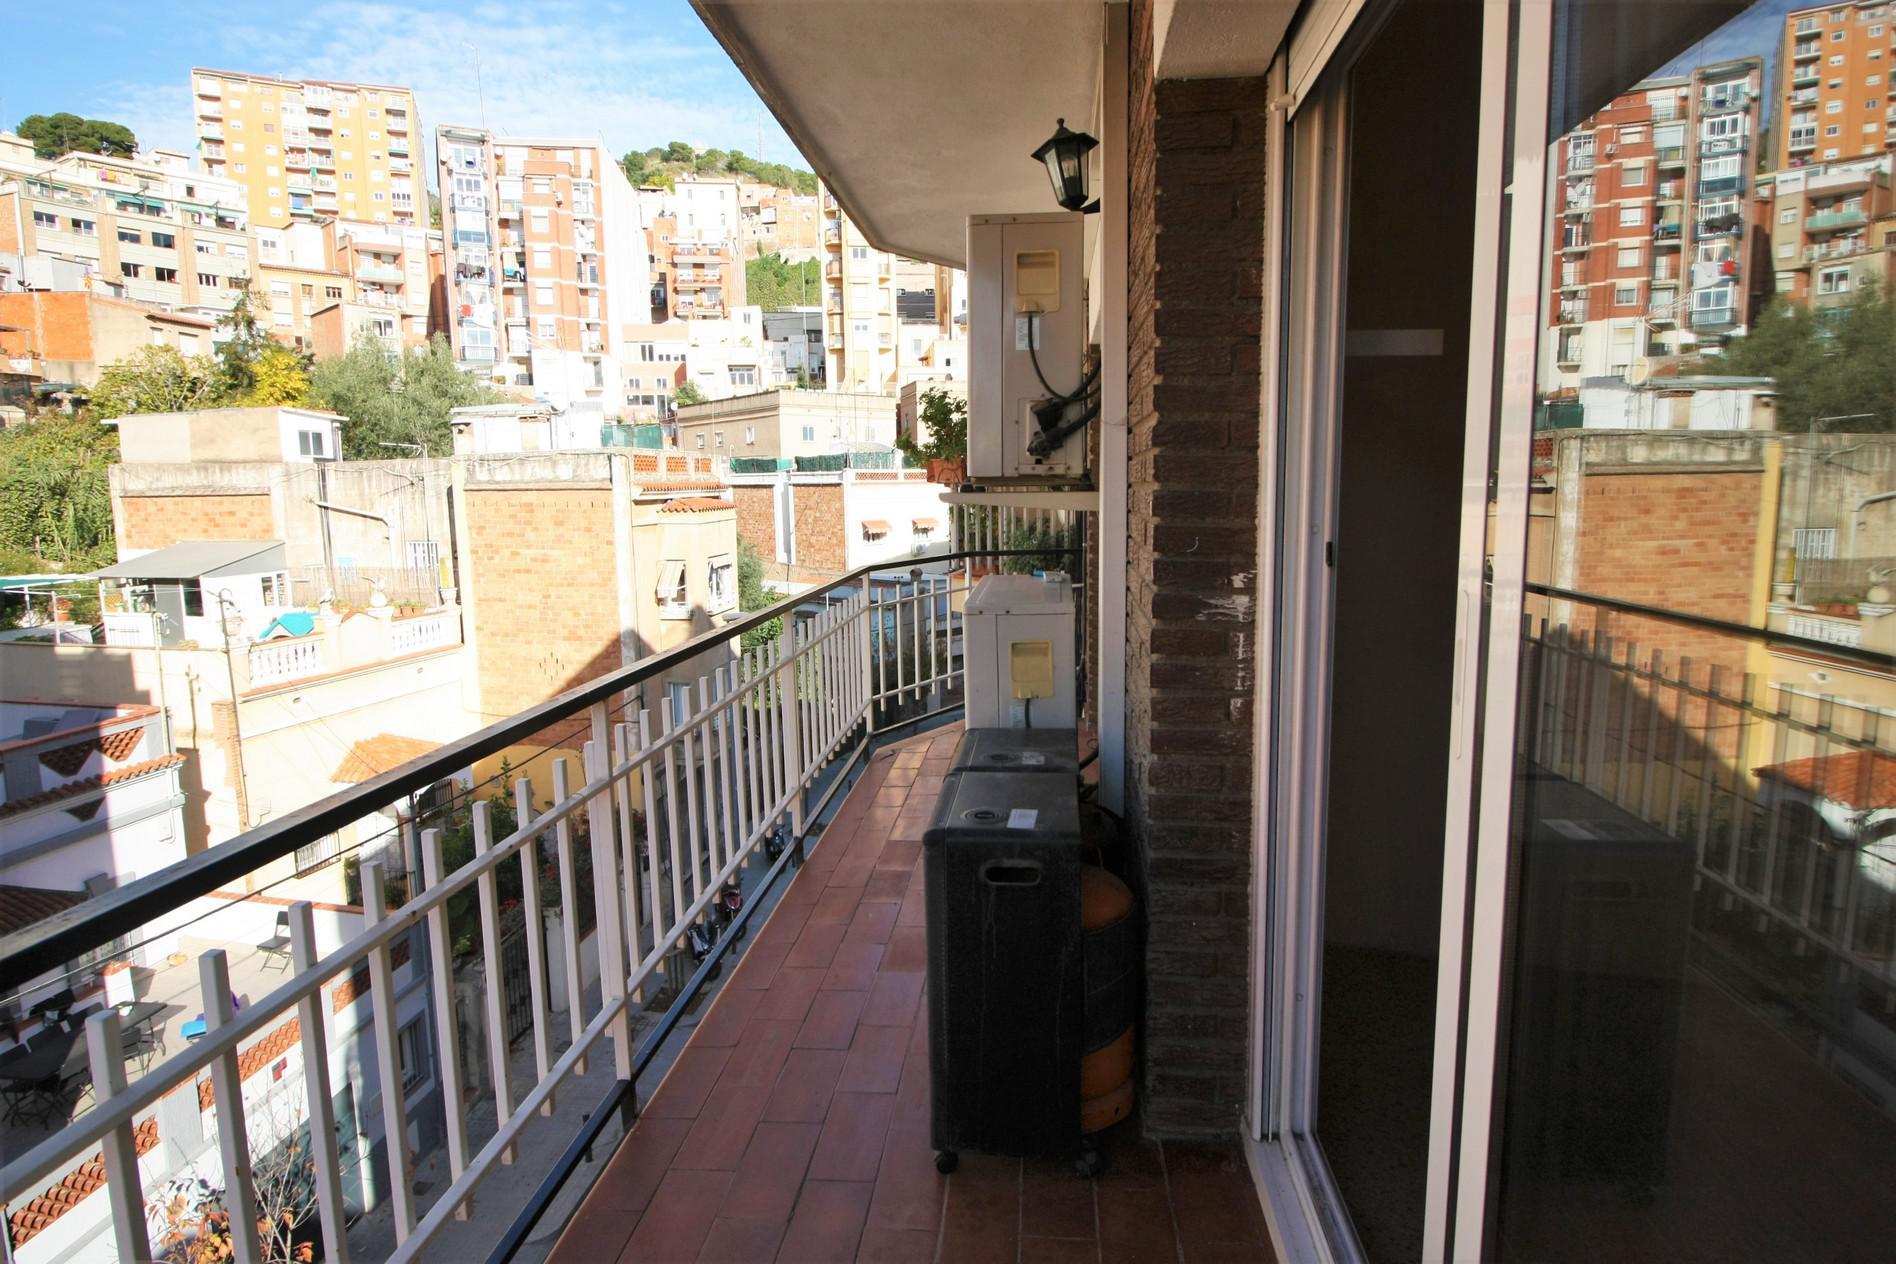 Imagen 3 Piso en venta en Barcelona / Jose Millan González - Josep Serrano